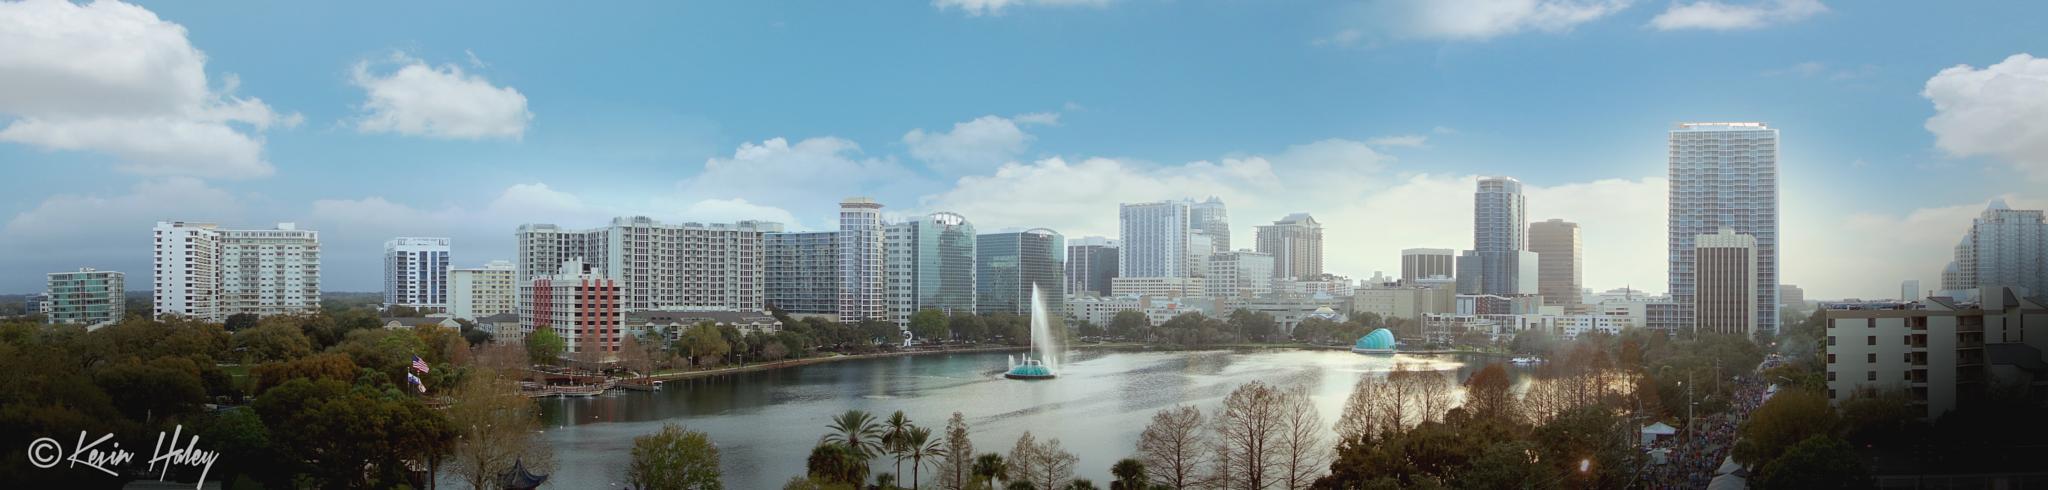 Orlando skyline by contact.kevinhaley